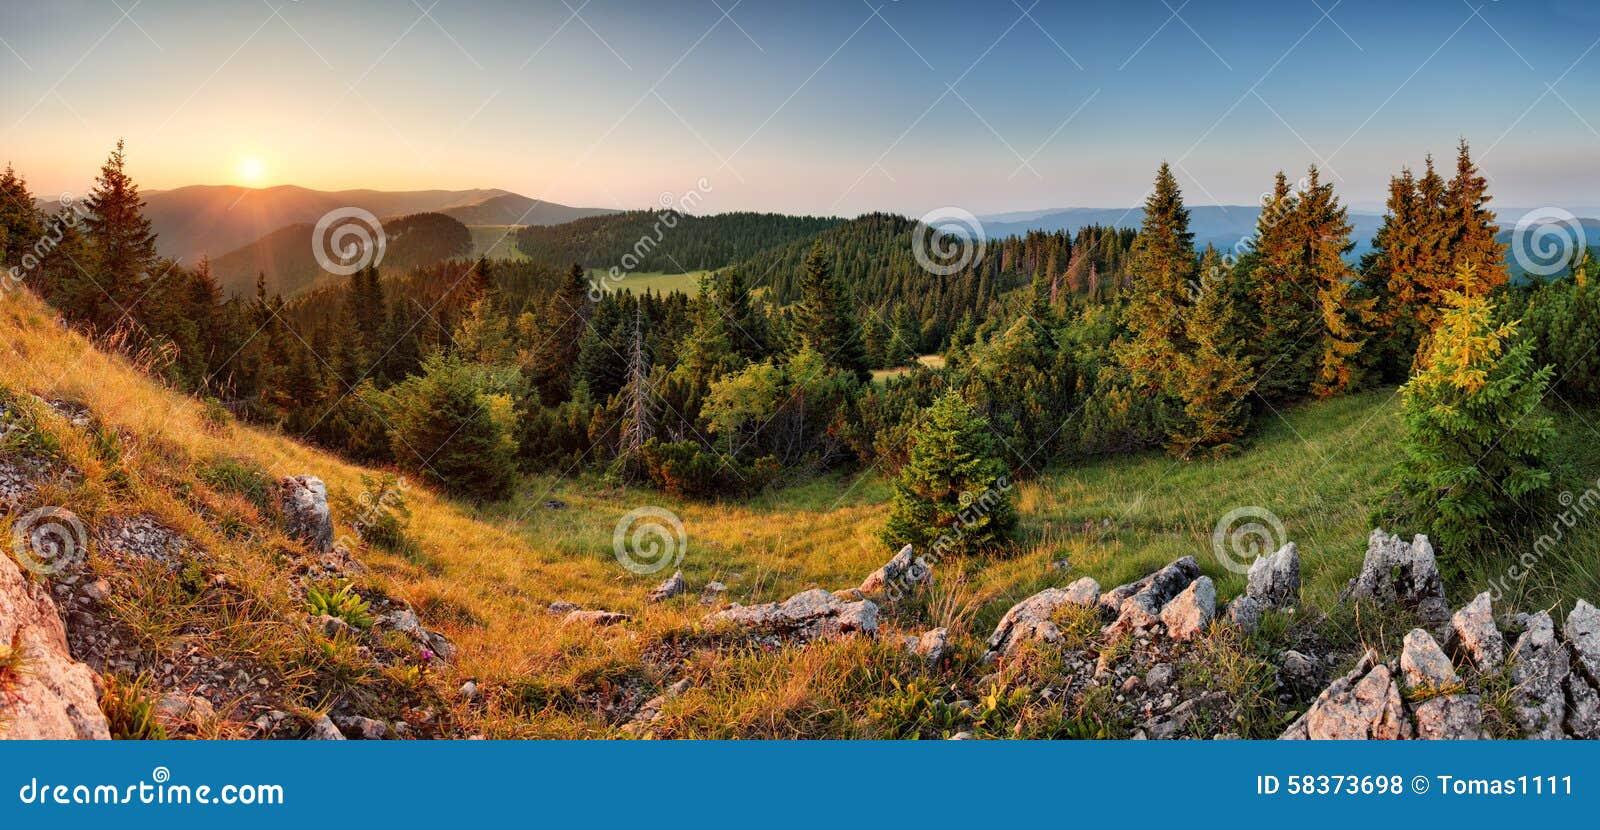 Gezierter Waldgrün-Berglandschaftspanoramasonnenuntergang - Slowakei